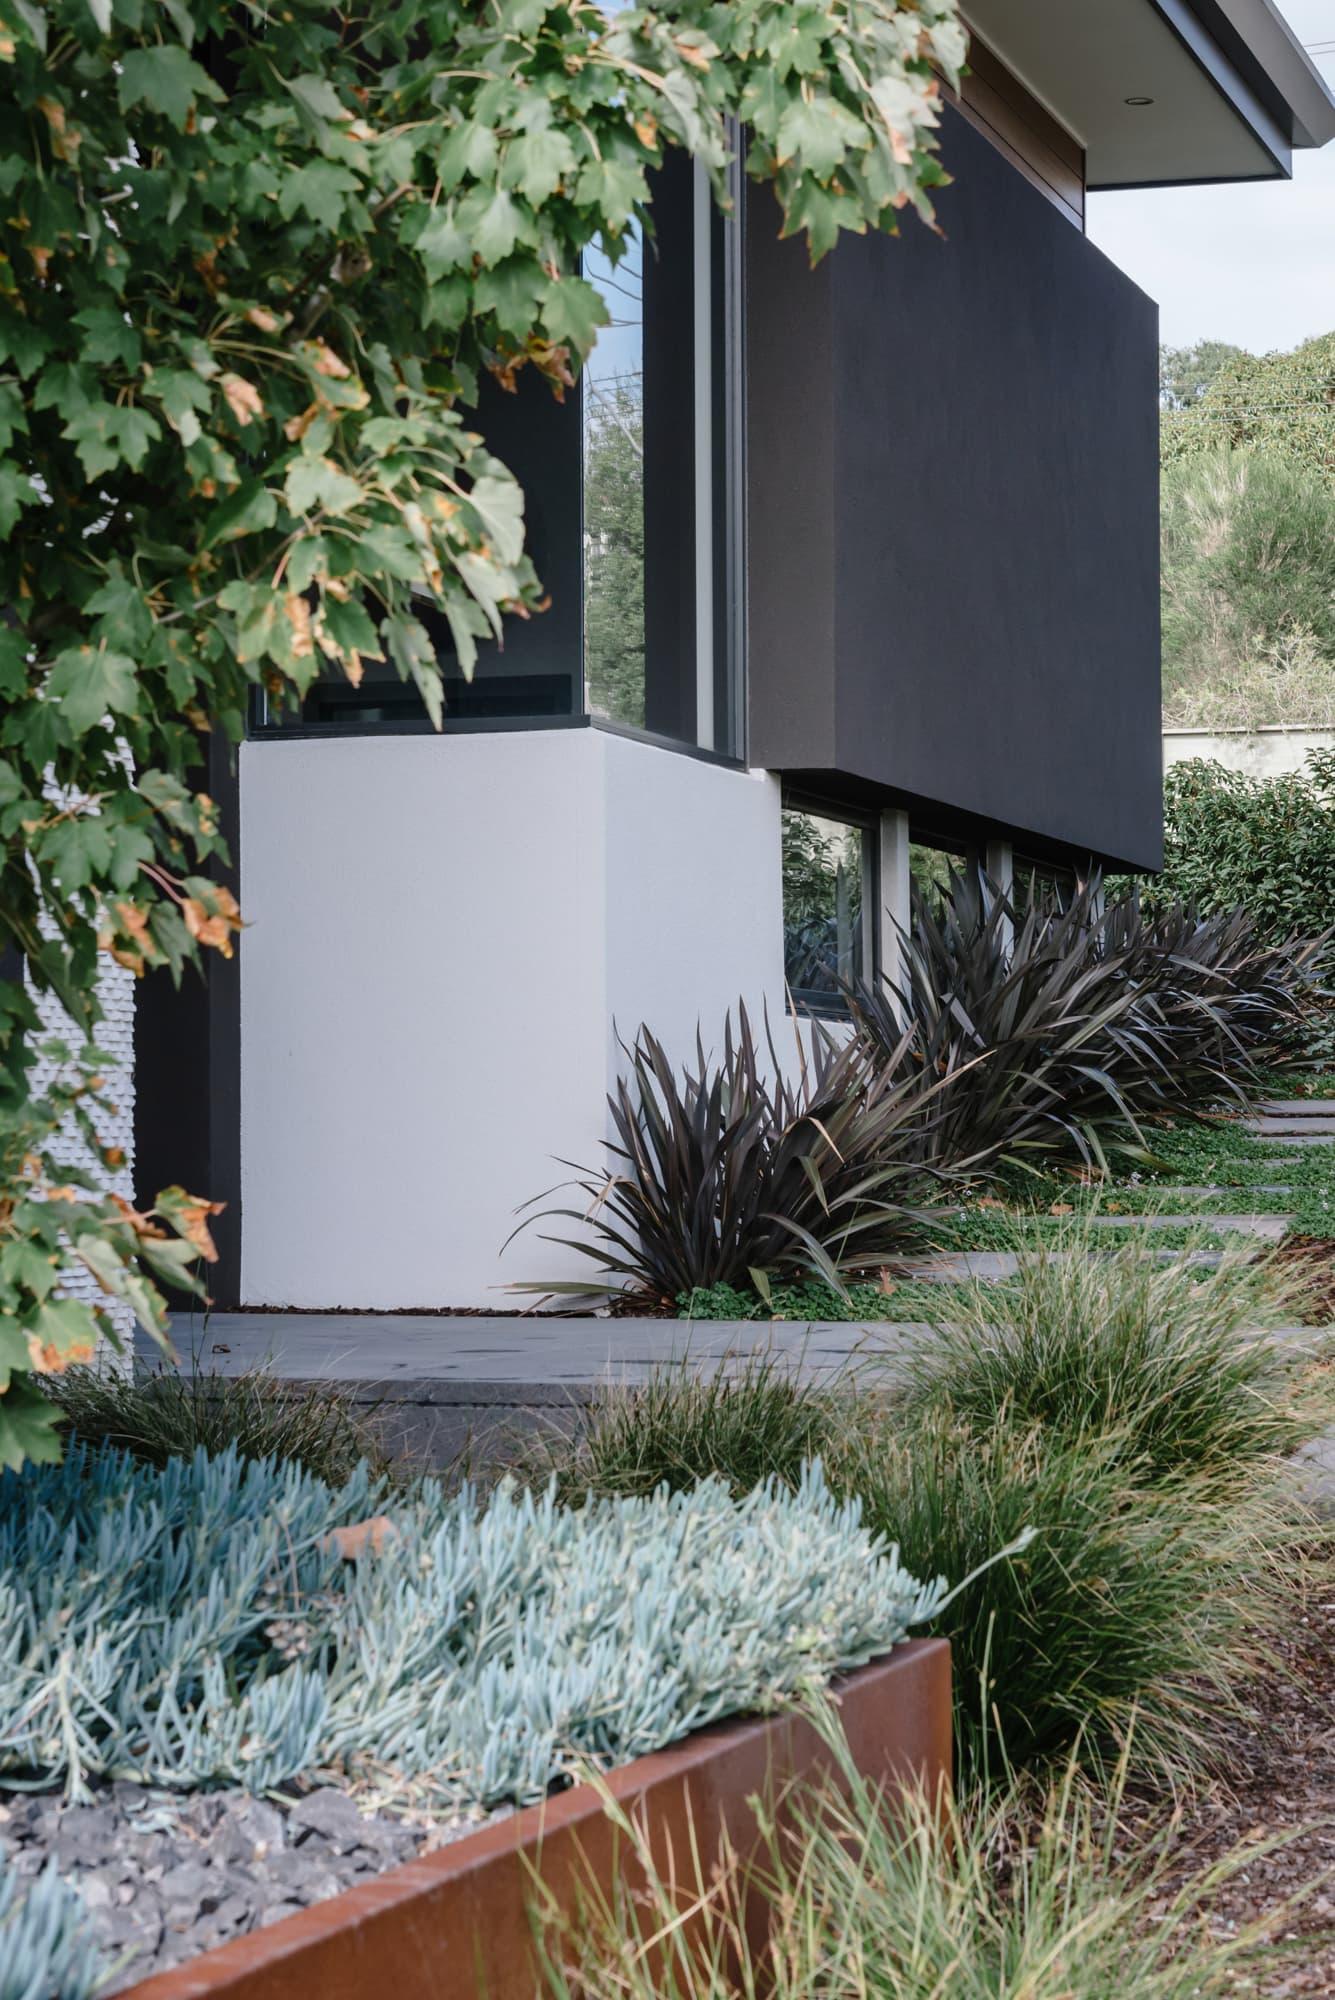 Mark Travers Landscape Architect